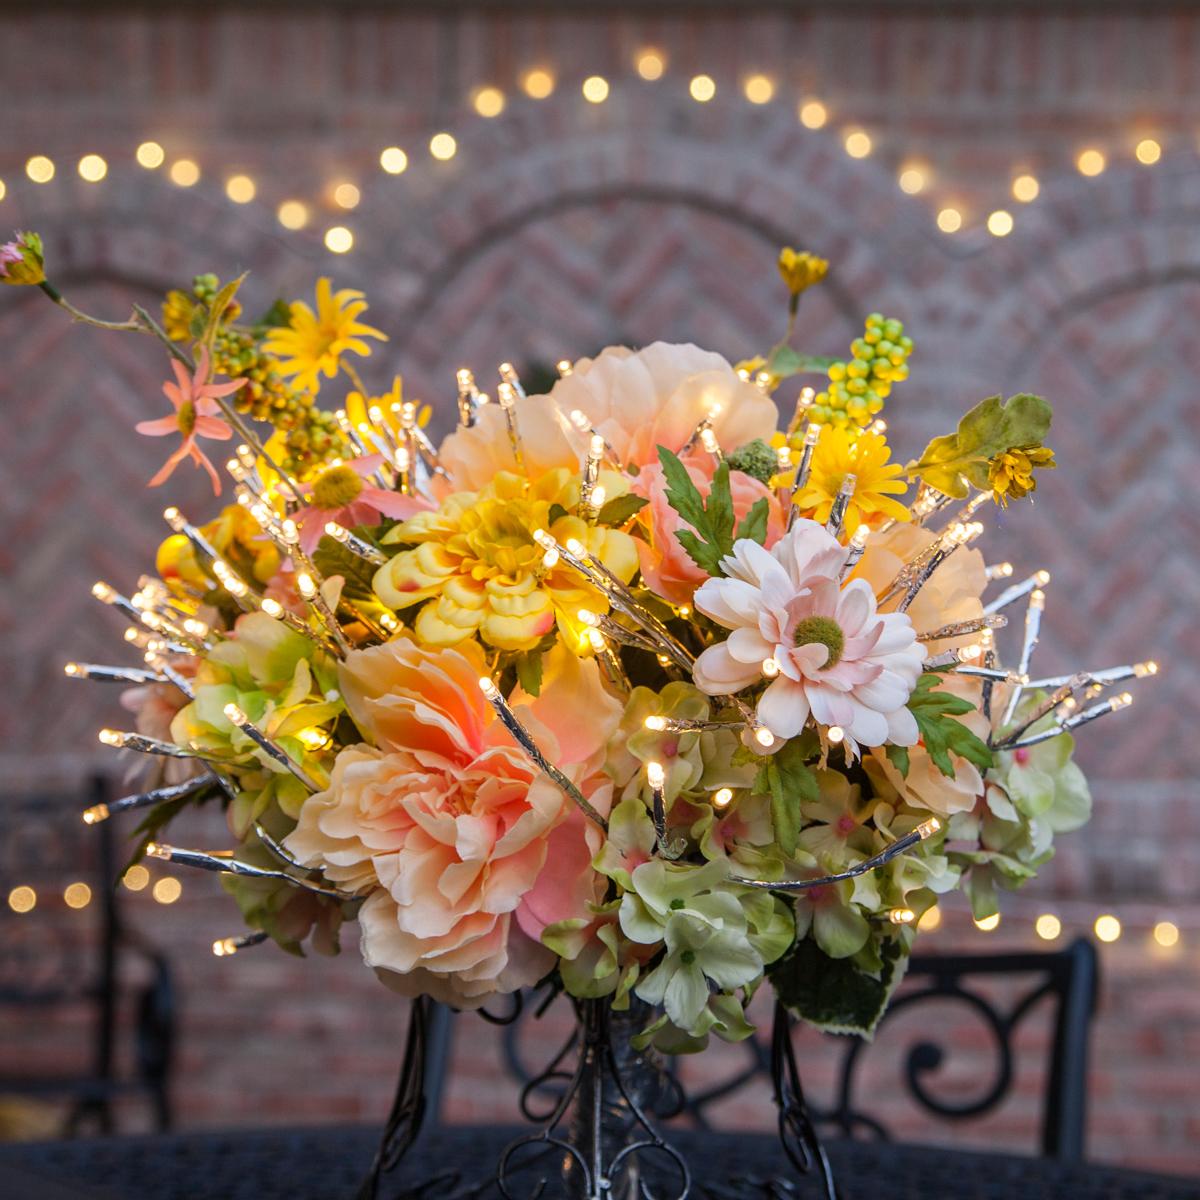 Starburst Lighted Branch Faux Floral Arrangement